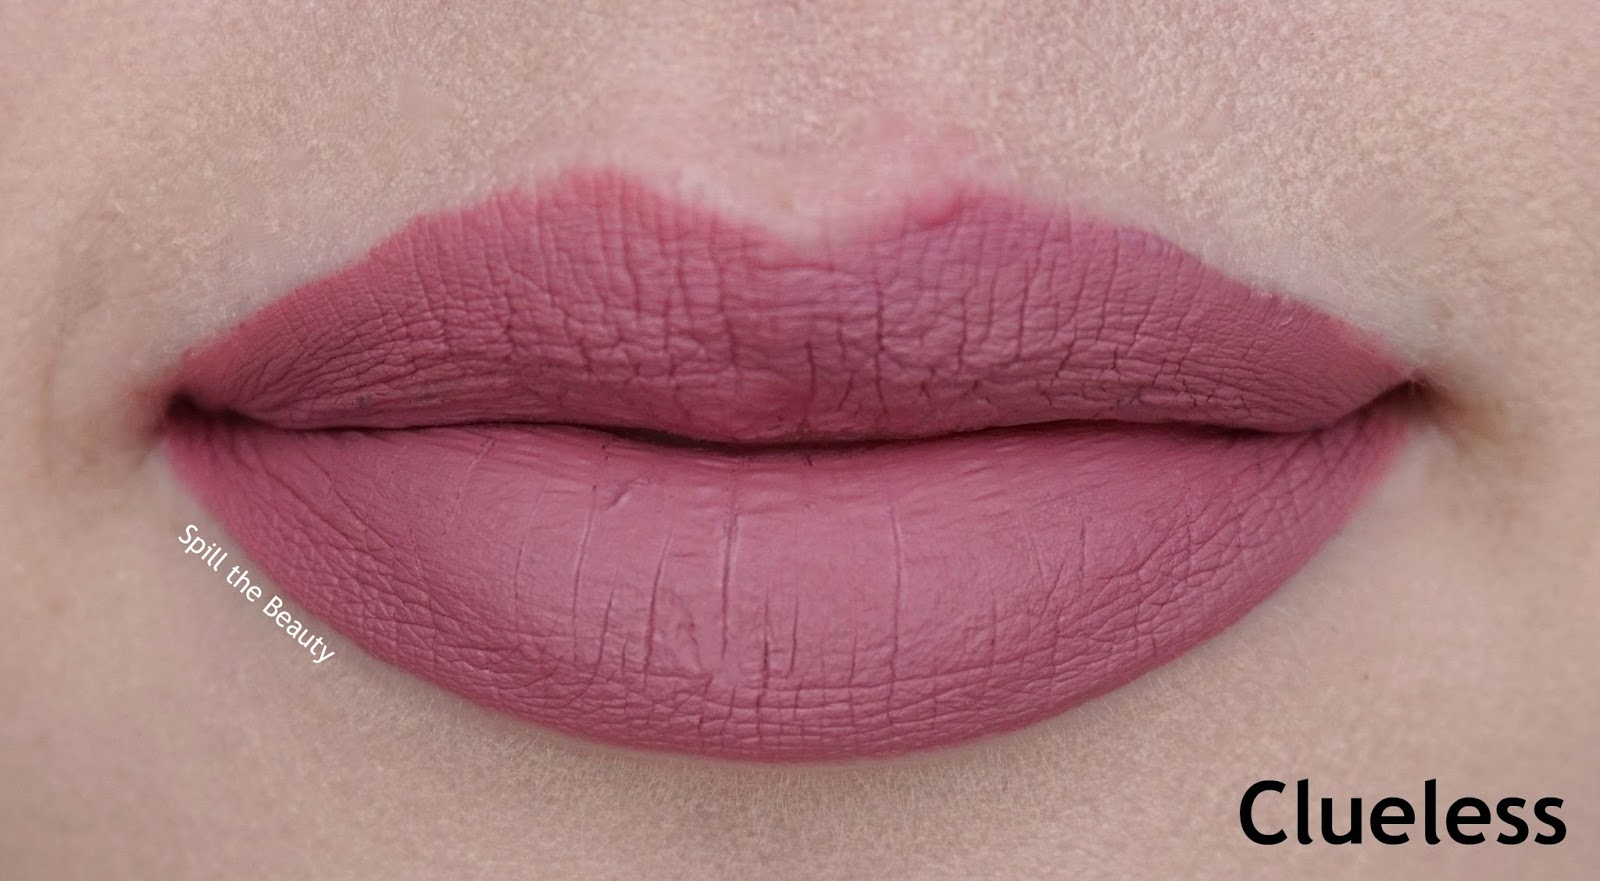 colourpop ultra matte lip review swatches 2 clueless - lips